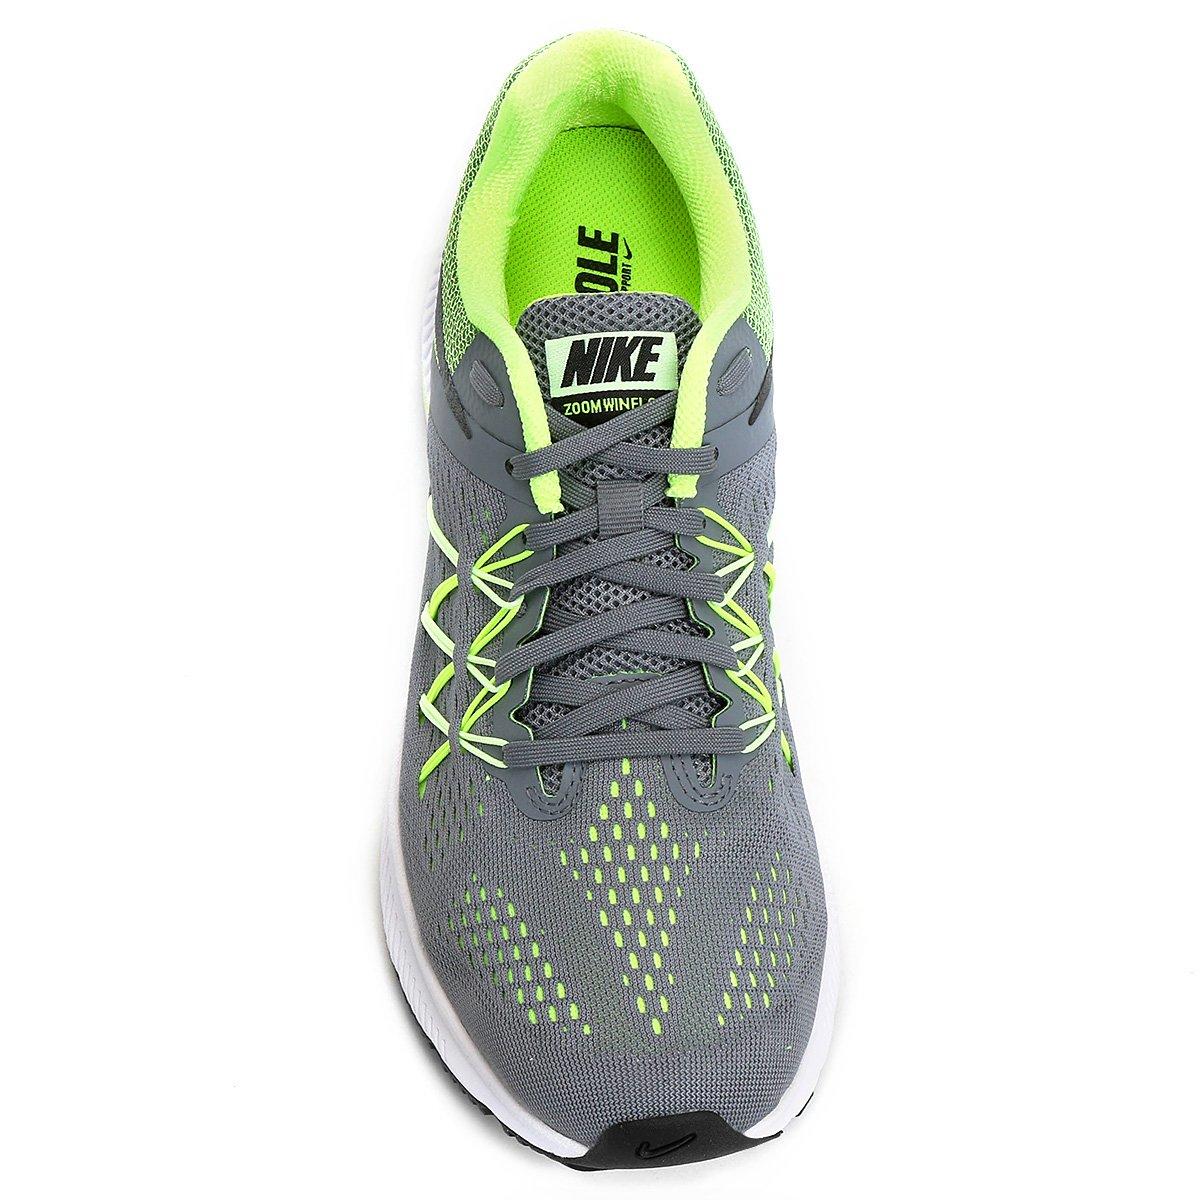 f37bb9b495e ... tênis nike zoom winflo 3 masculino cinza e verde limão